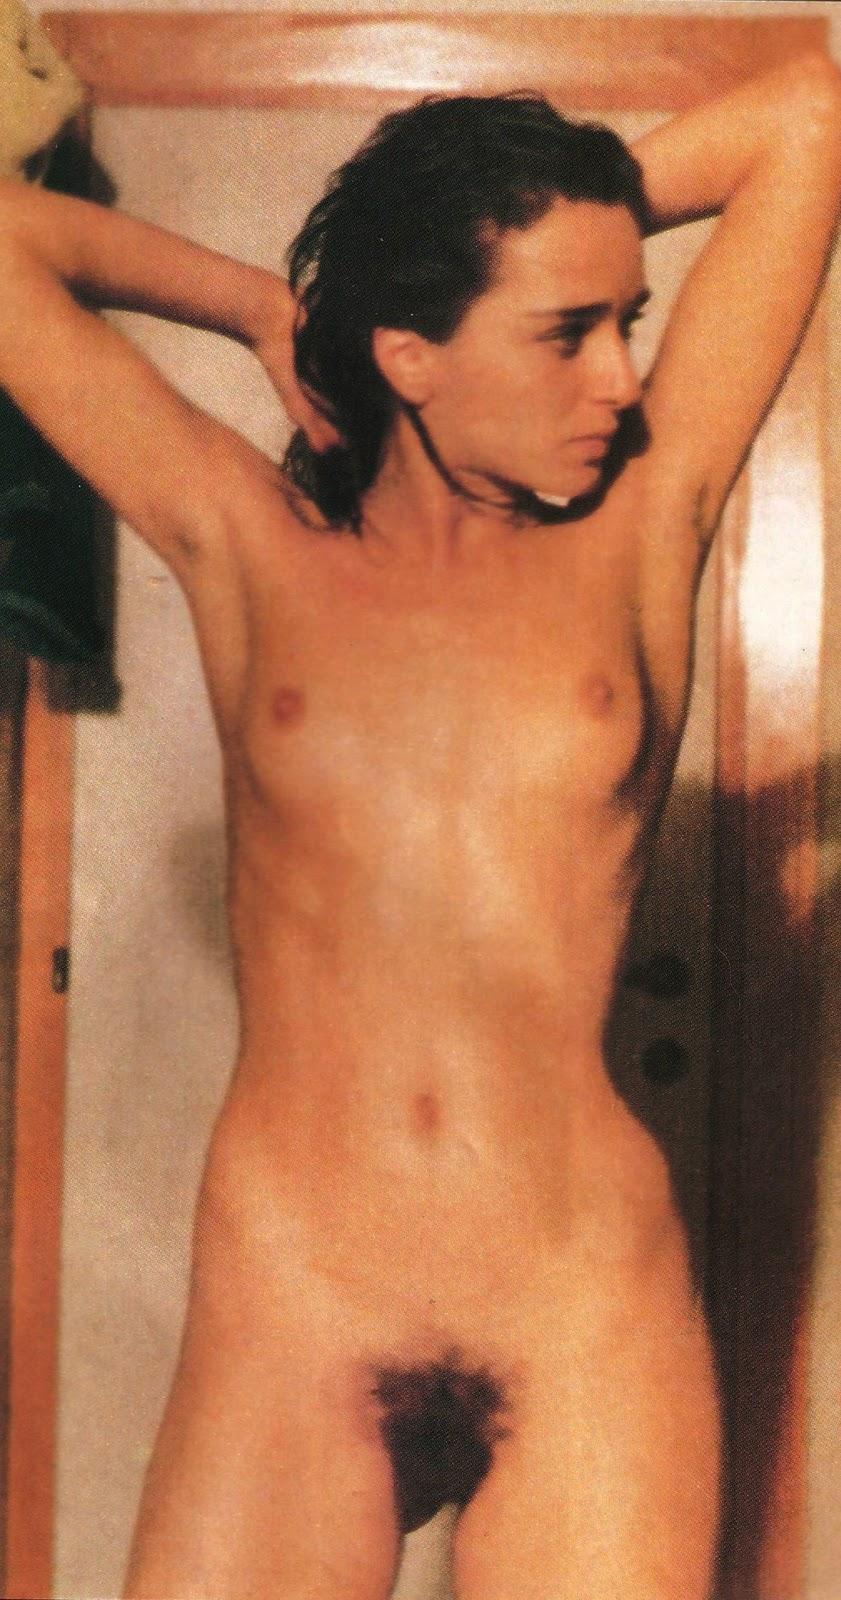 Nadia Da Ferro Porno Online Alluc elisabeth rohm the kreutzer sonata sex scene - wiki